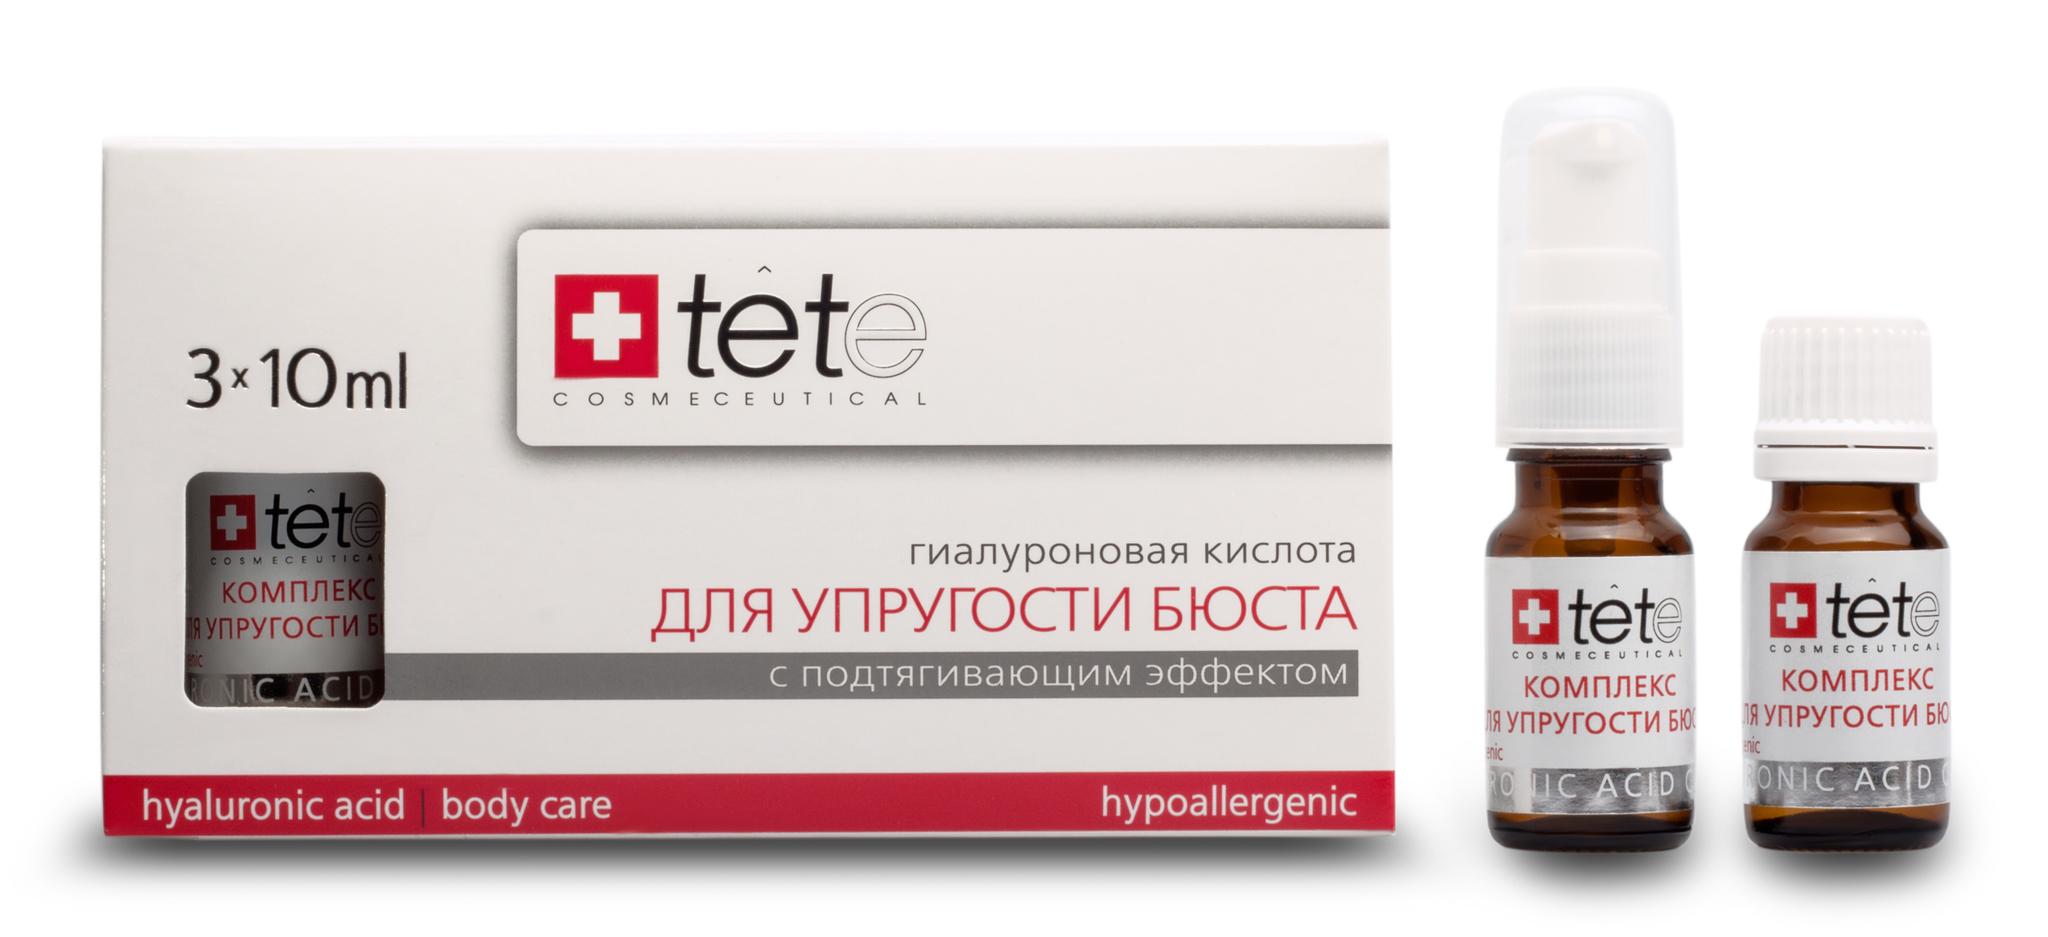 Гиалуроновая кислота + Комплекс для упругости бюста / TETe Hyaluronic acid and neck and decolette 3*10 ml